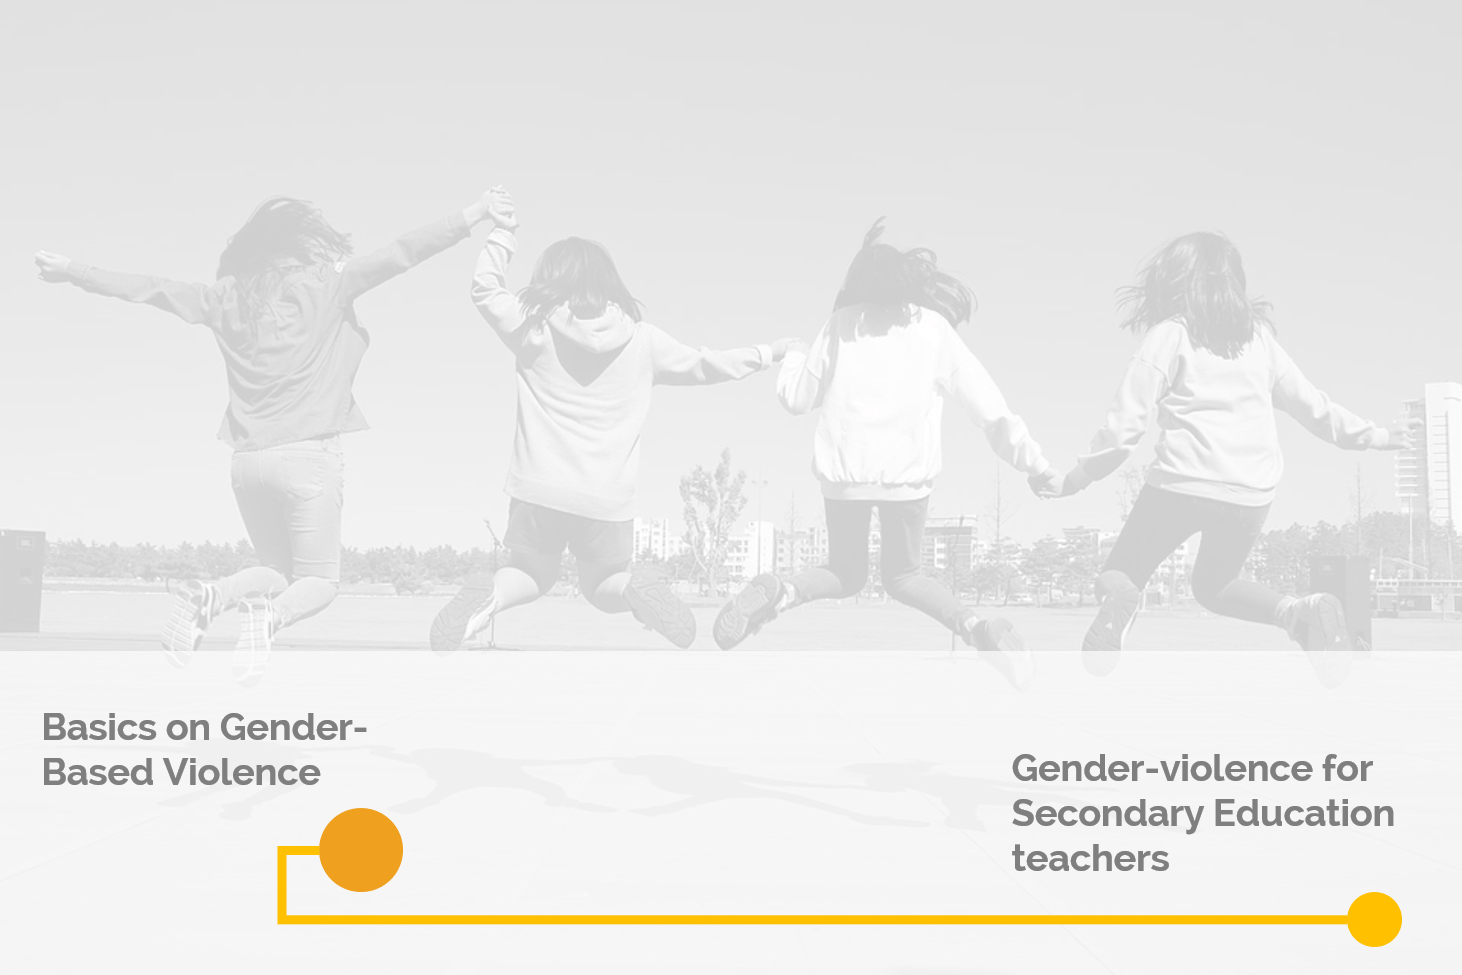 Gender-based violence for Secondary Education teachers